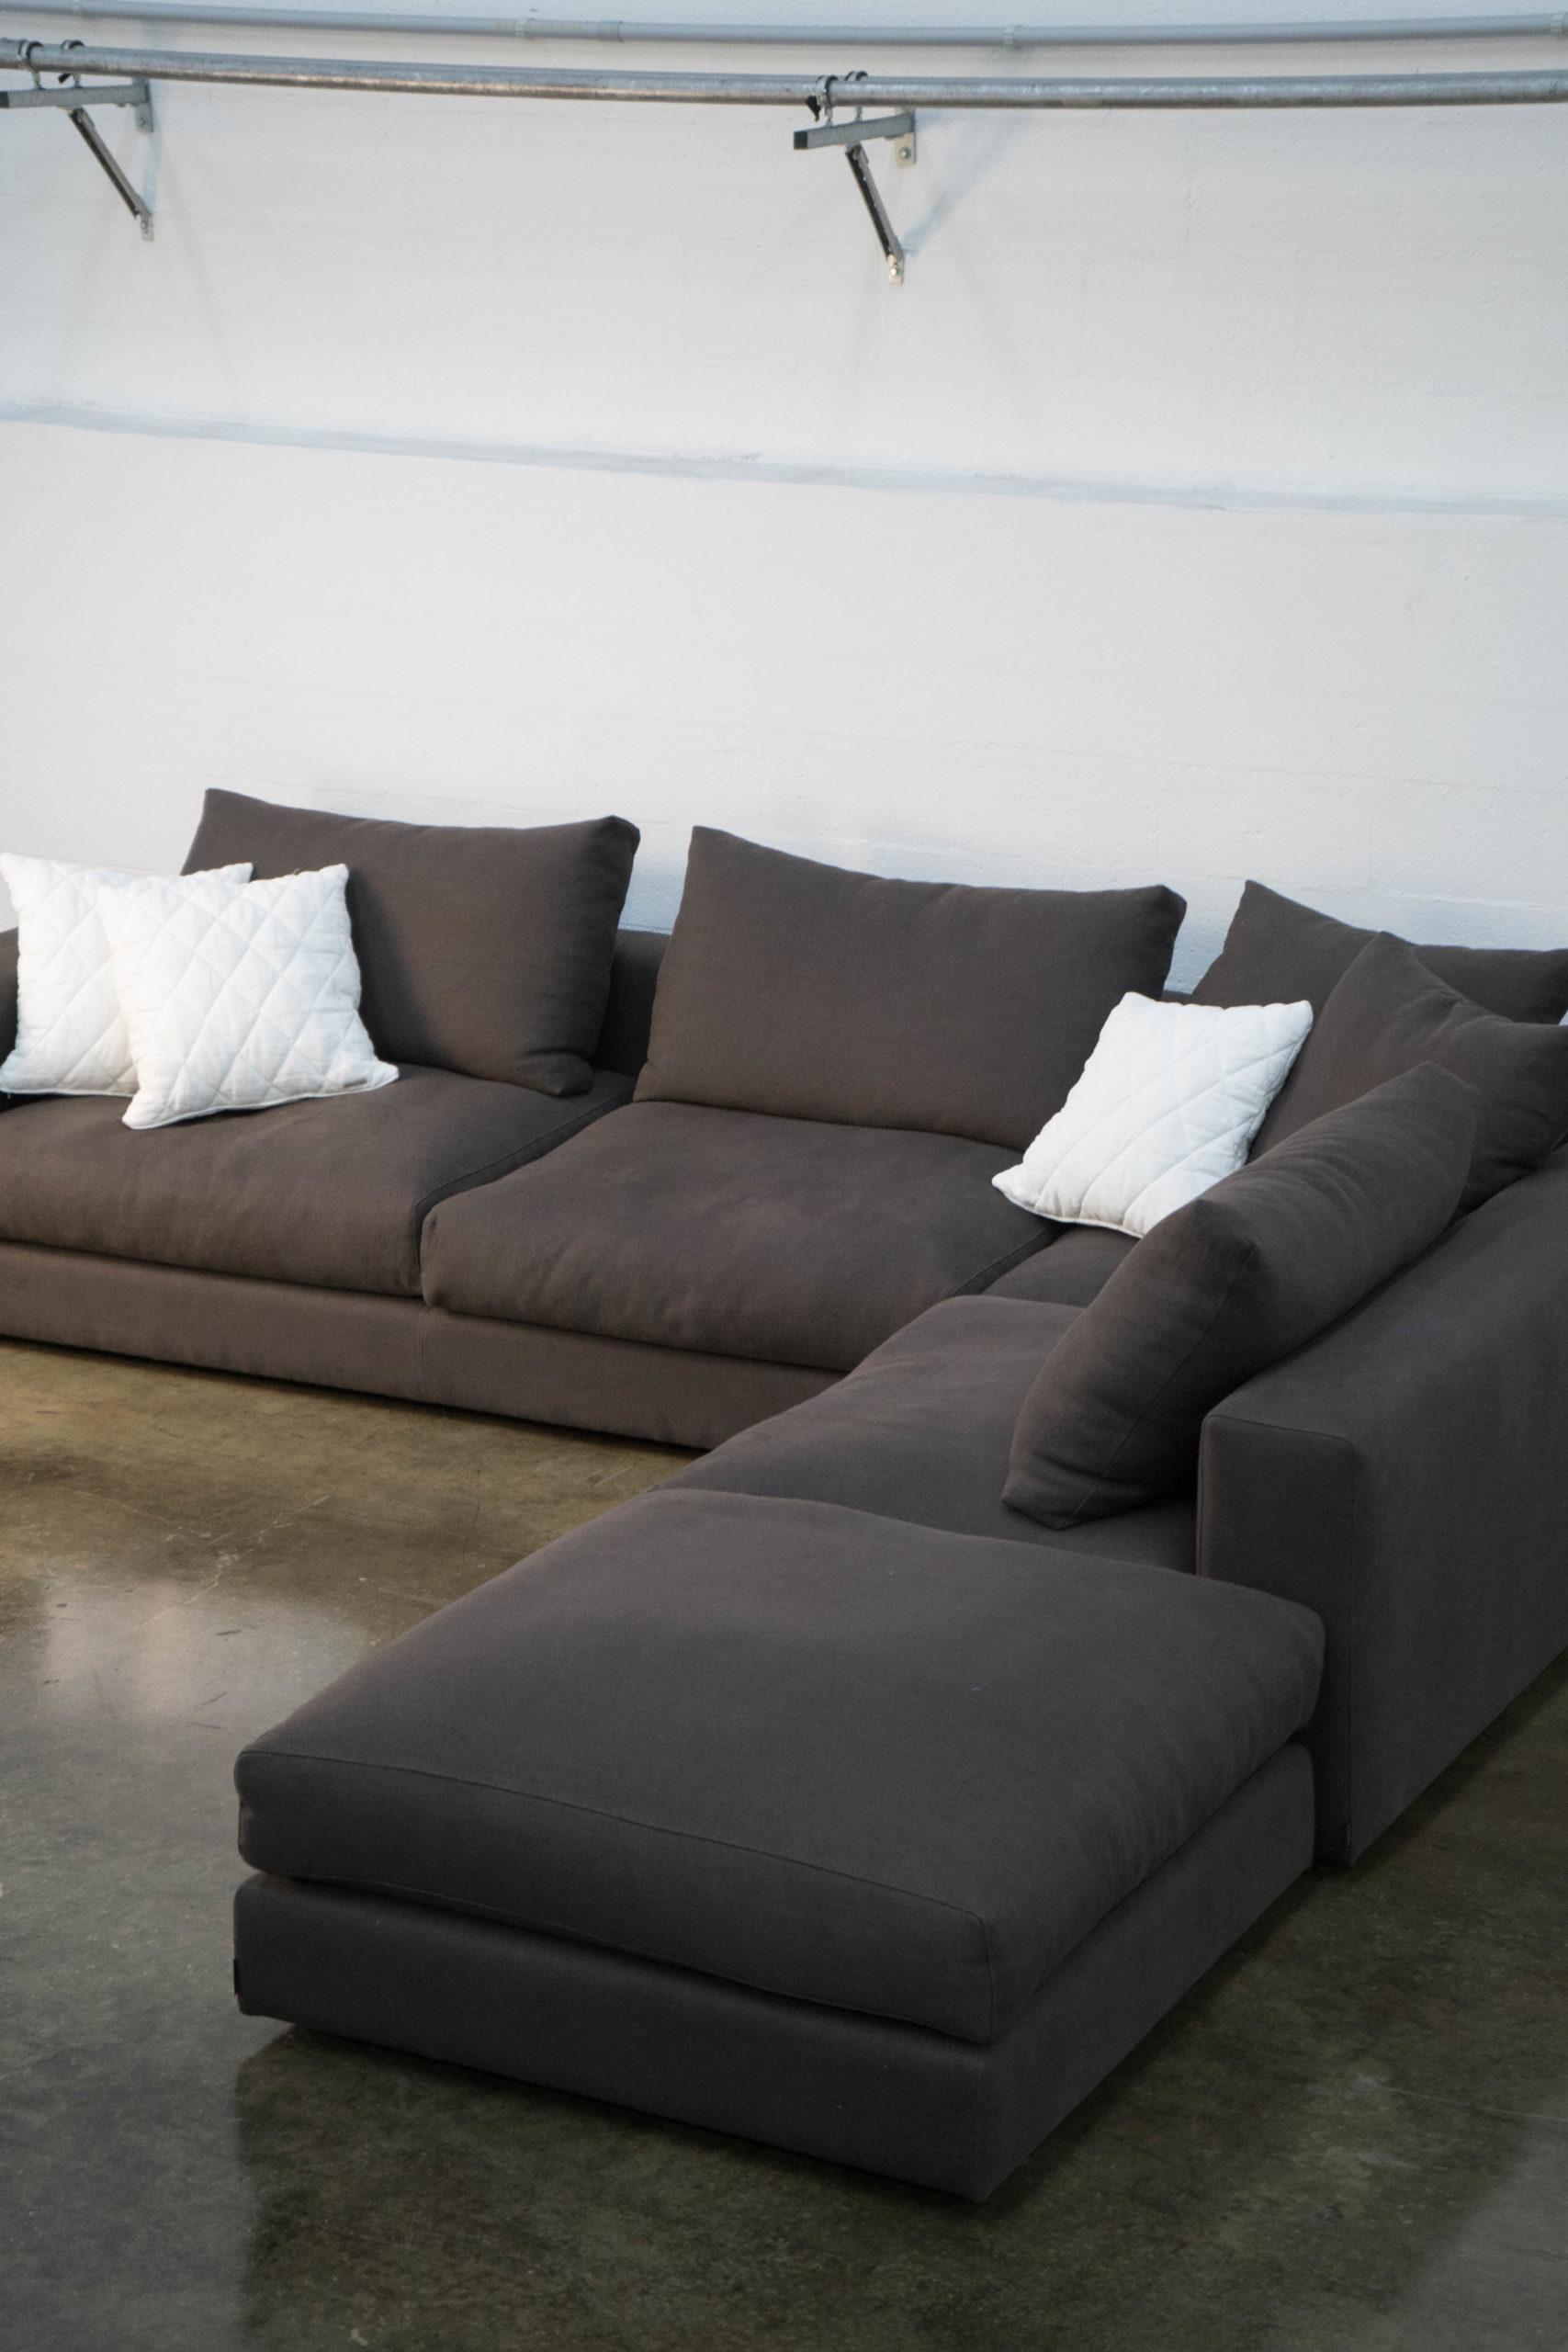 sofa decoracion casa marron grande chaise